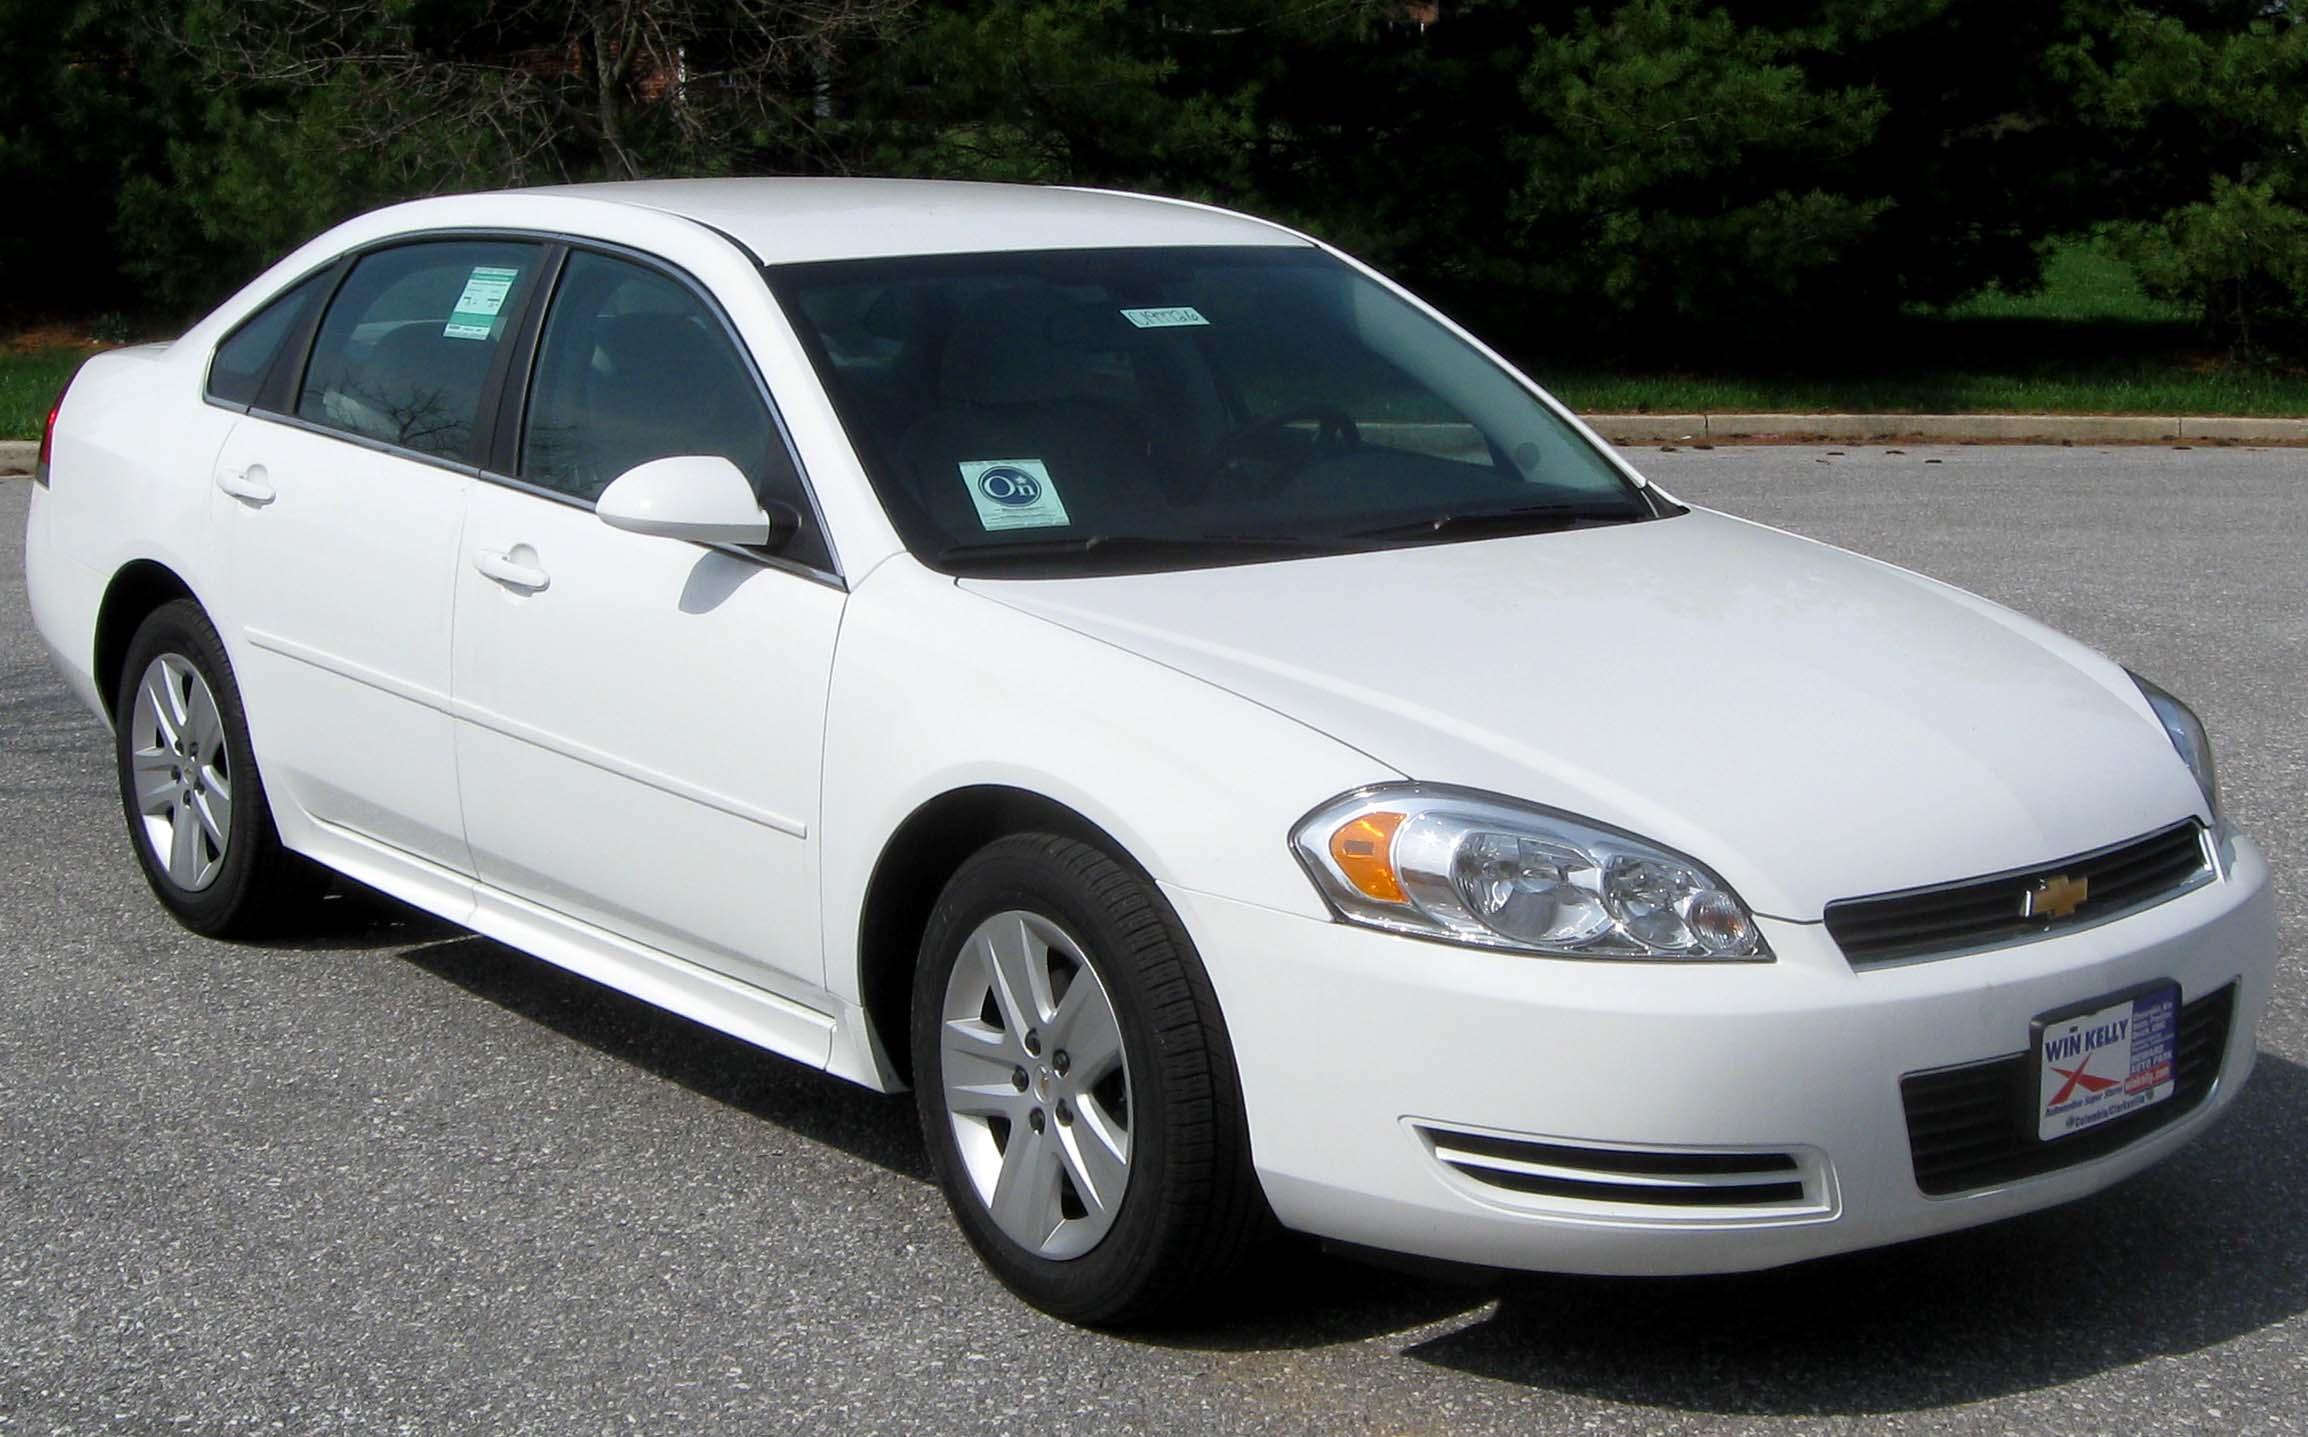 used 2002 chevrolet impala features specs edmunds autos post. Black Bedroom Furniture Sets. Home Design Ideas